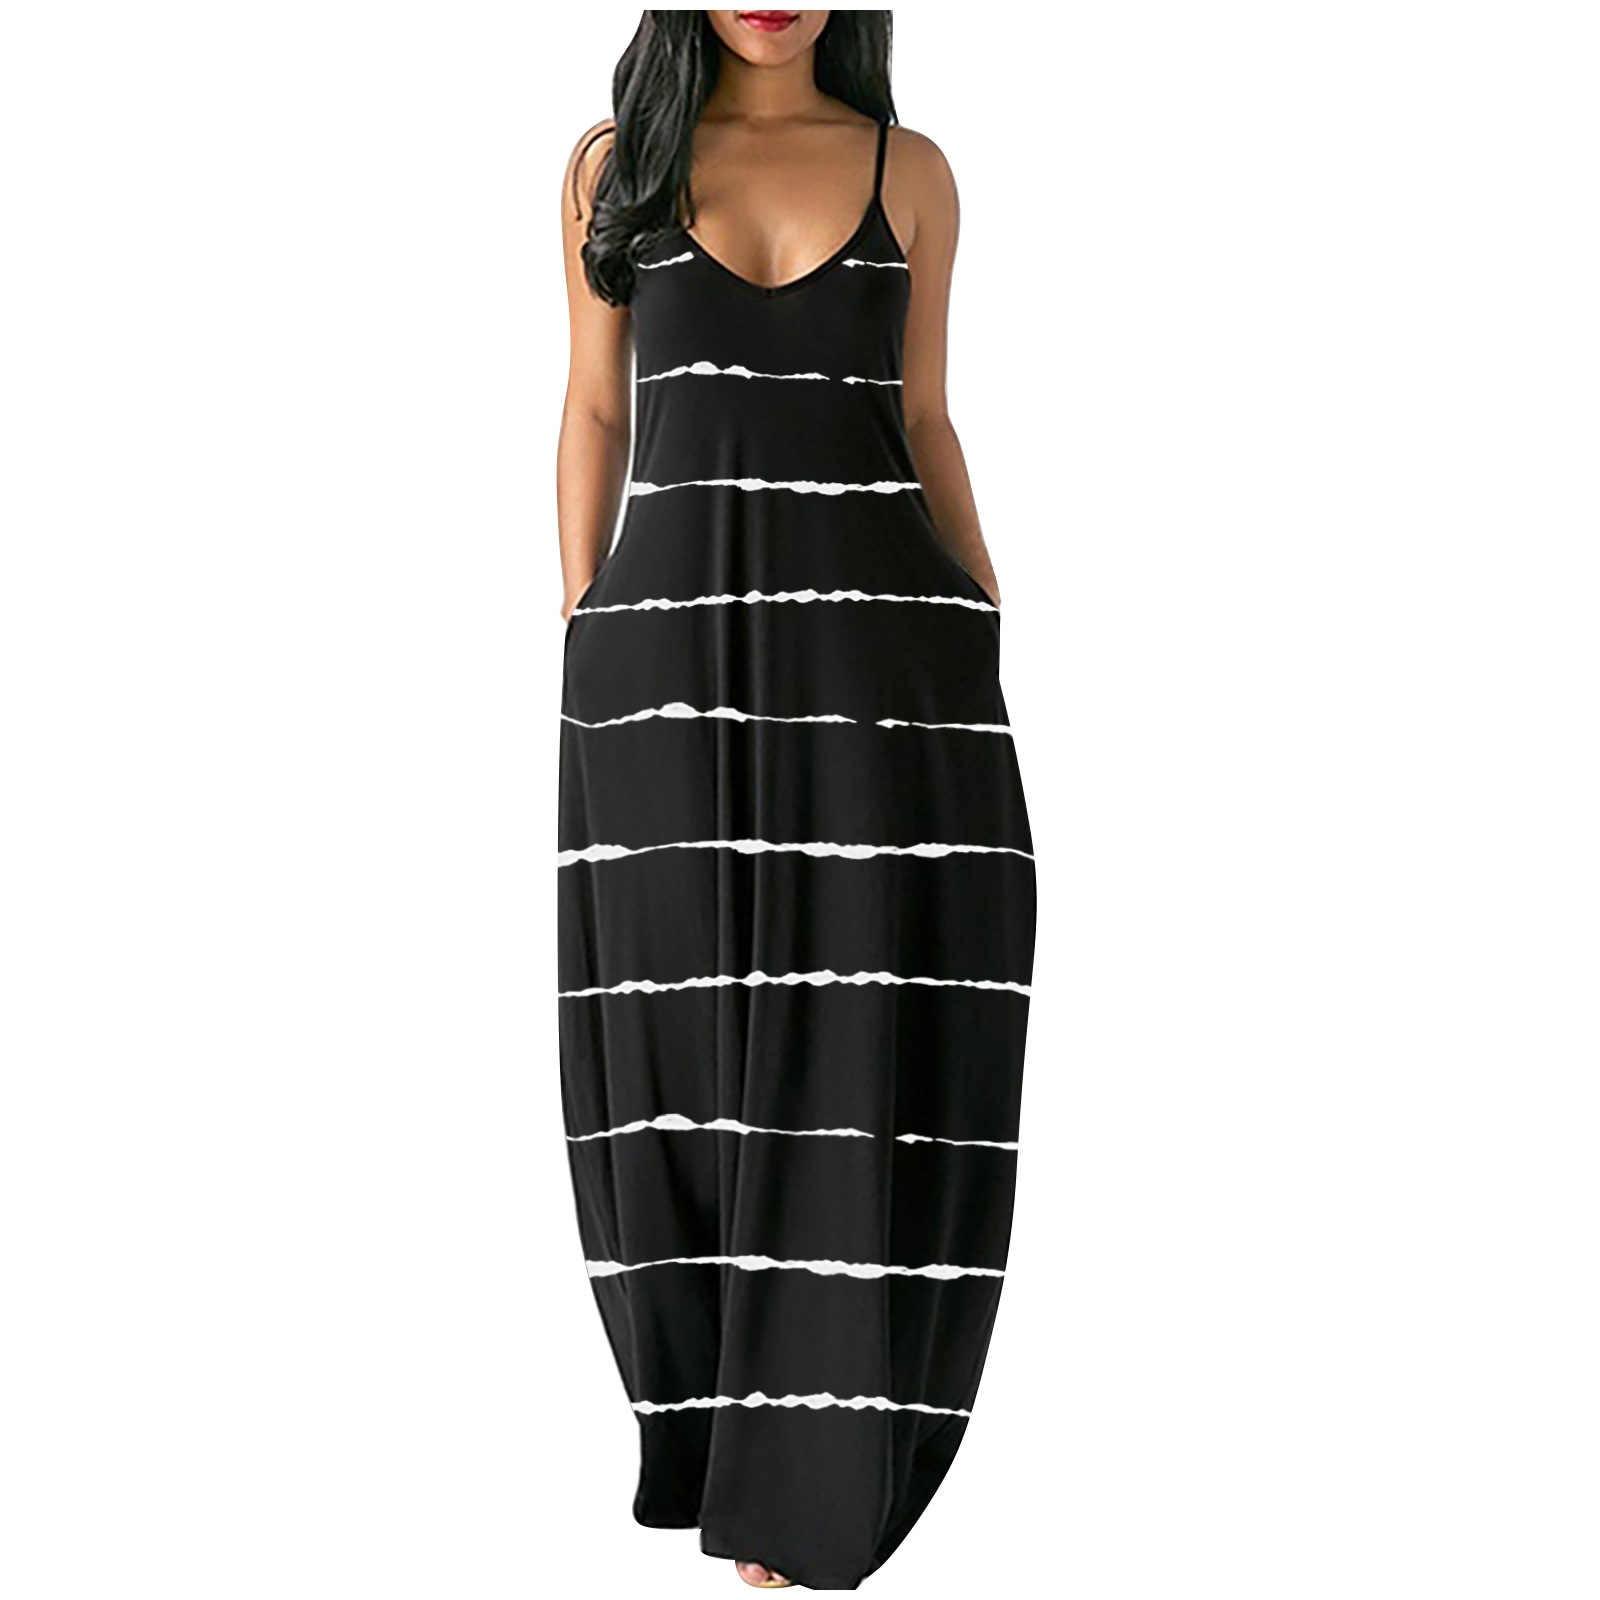 Womens Spaghetti Strap Maxi Dresses Rainbow Striped Loose V Neck Beach Dress Summer Causal Swing Long Sundress